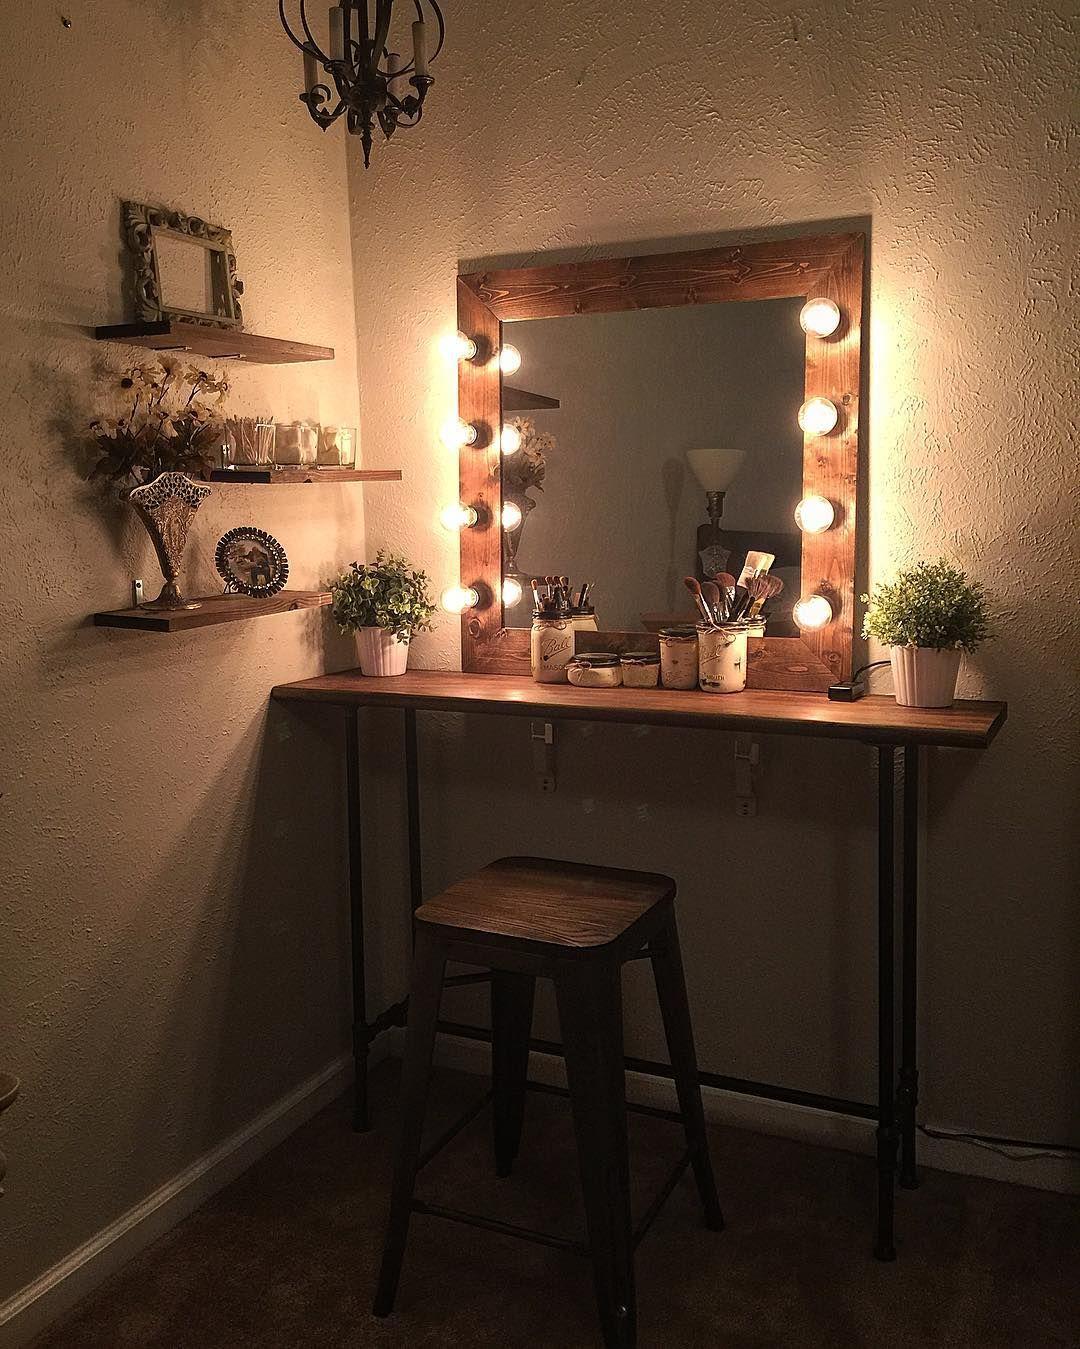 Rustic DIY Vanity Makeup Mirror with Lights